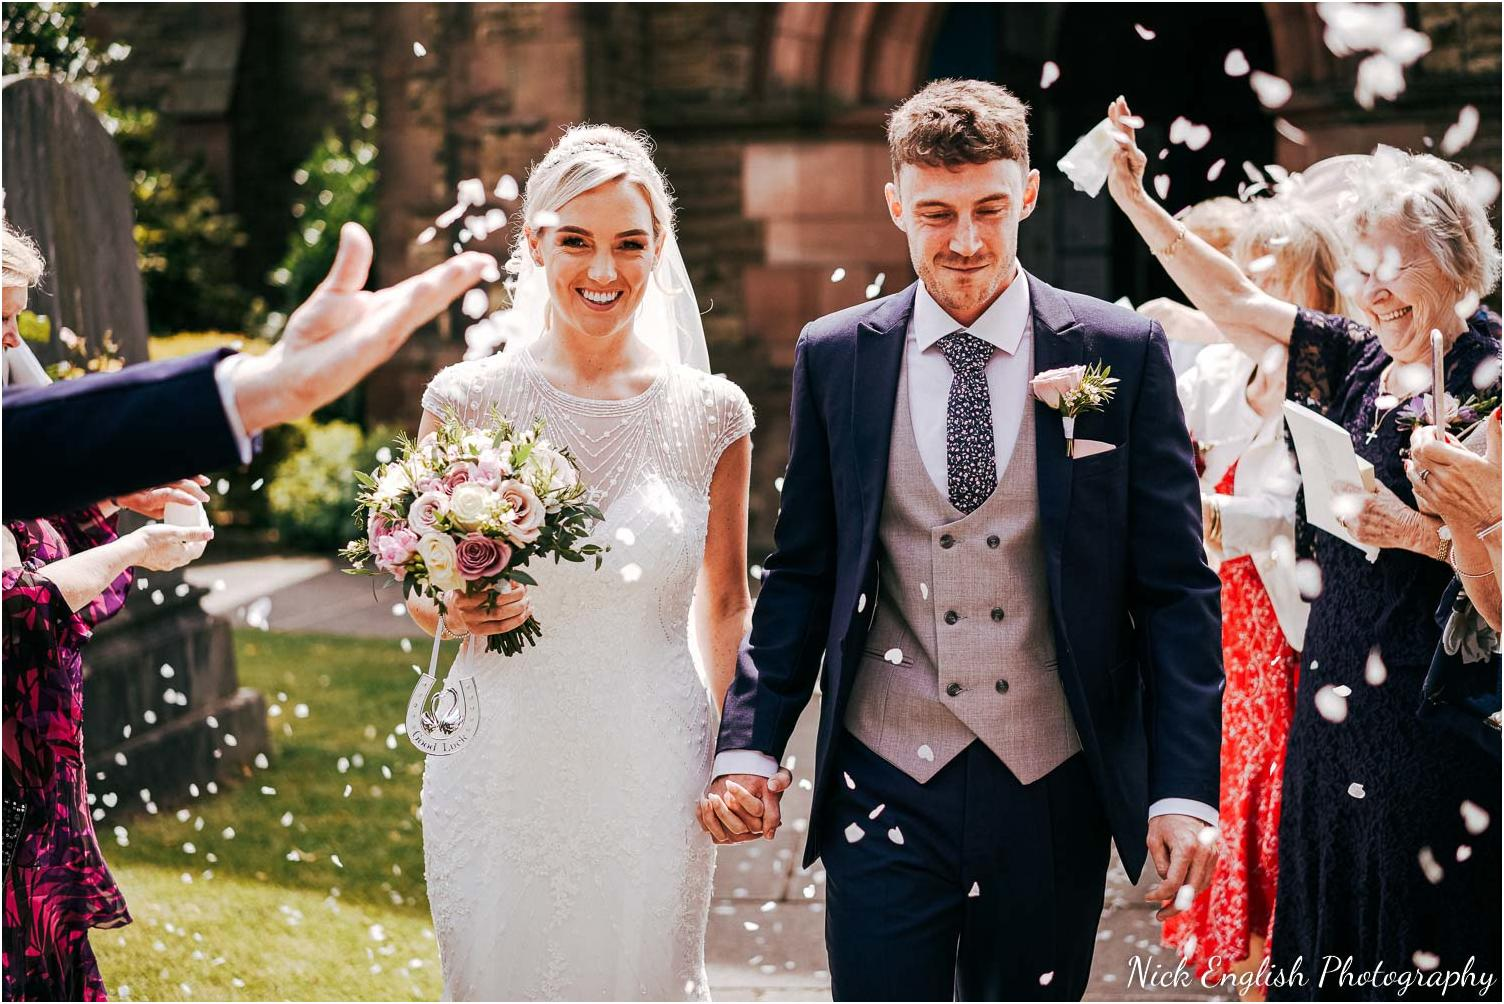 Mitton_Hall_Wedding_Photograph-53.jpg